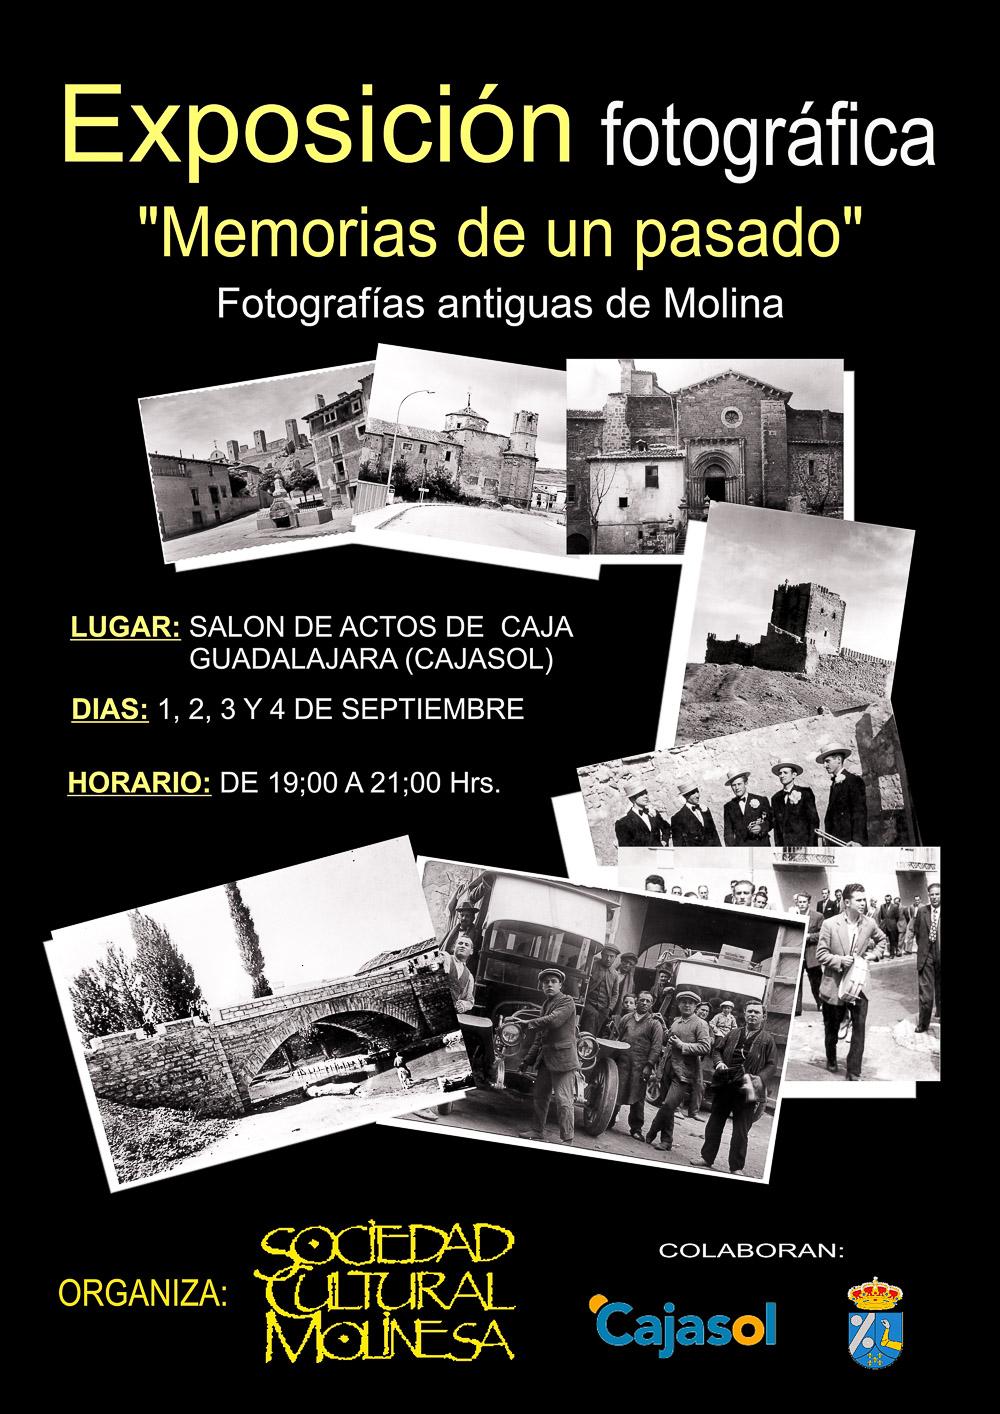 ESP FOTOS MOLINA 2011